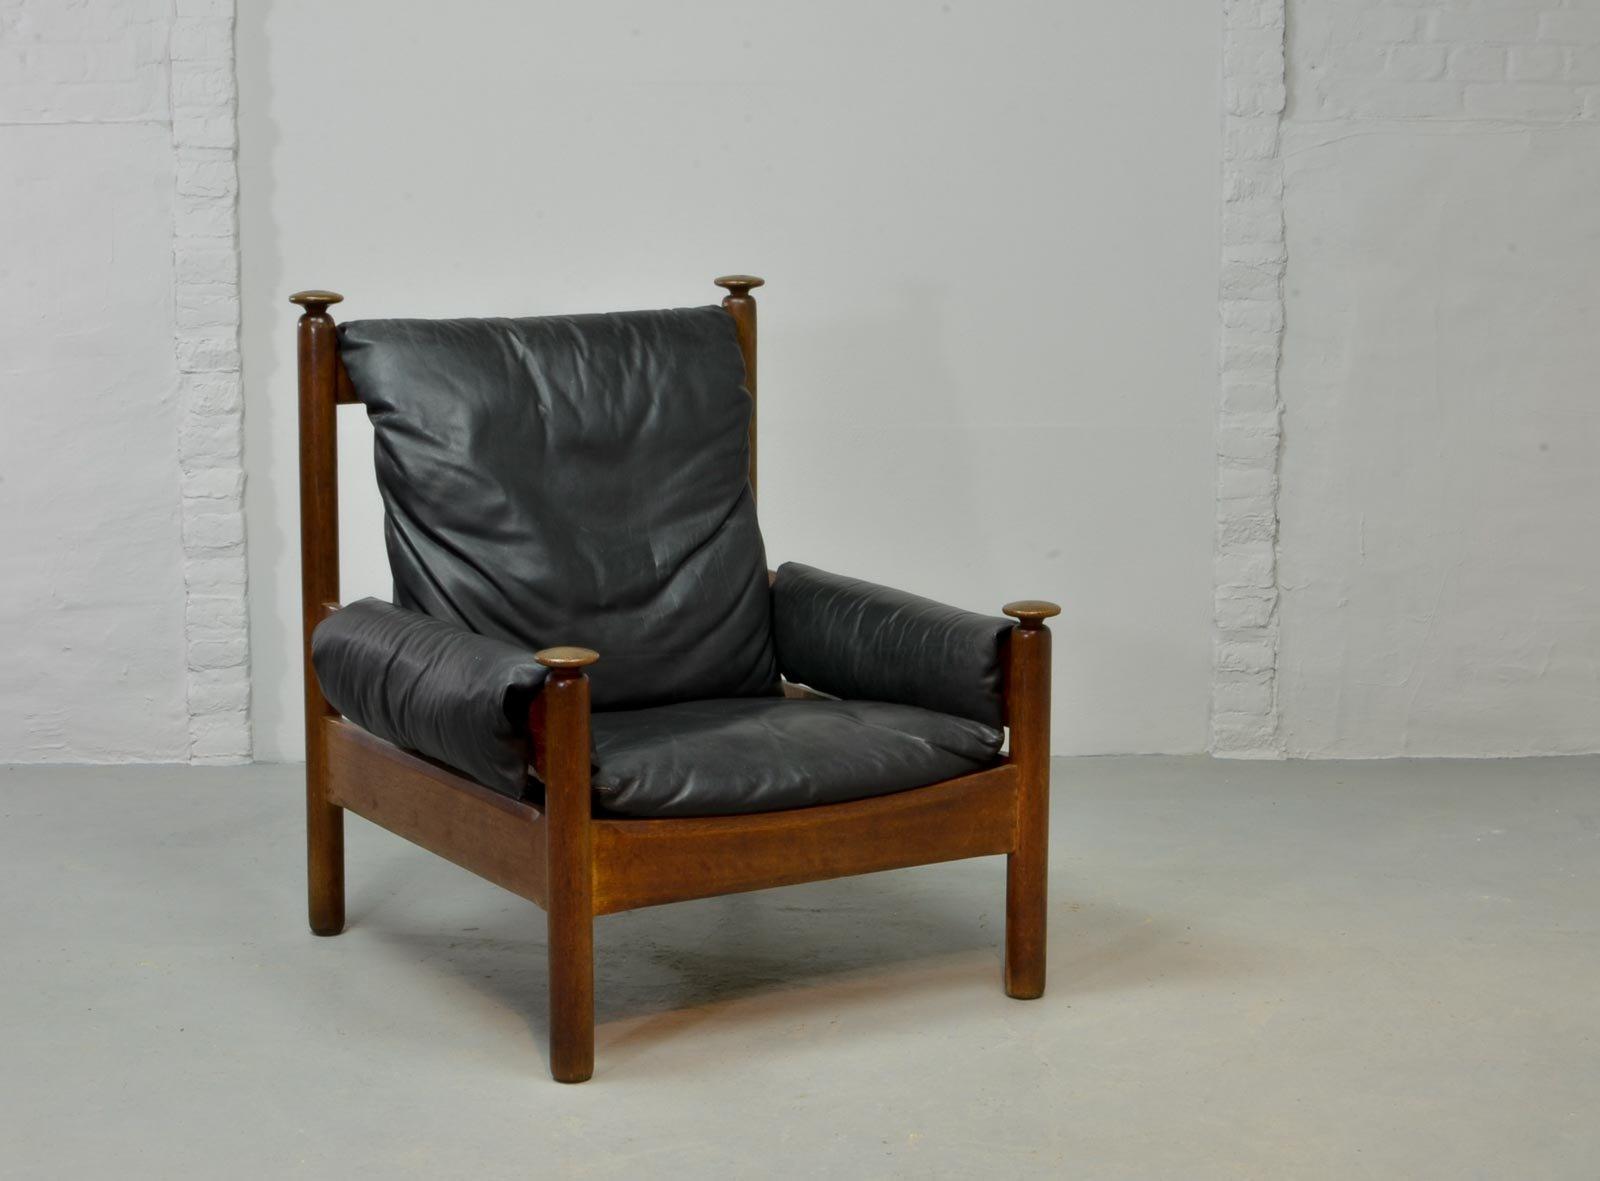 skandinavischer sessel mit schwarzem leder bezug 1960er bei pamono kaufen. Black Bedroom Furniture Sets. Home Design Ideas